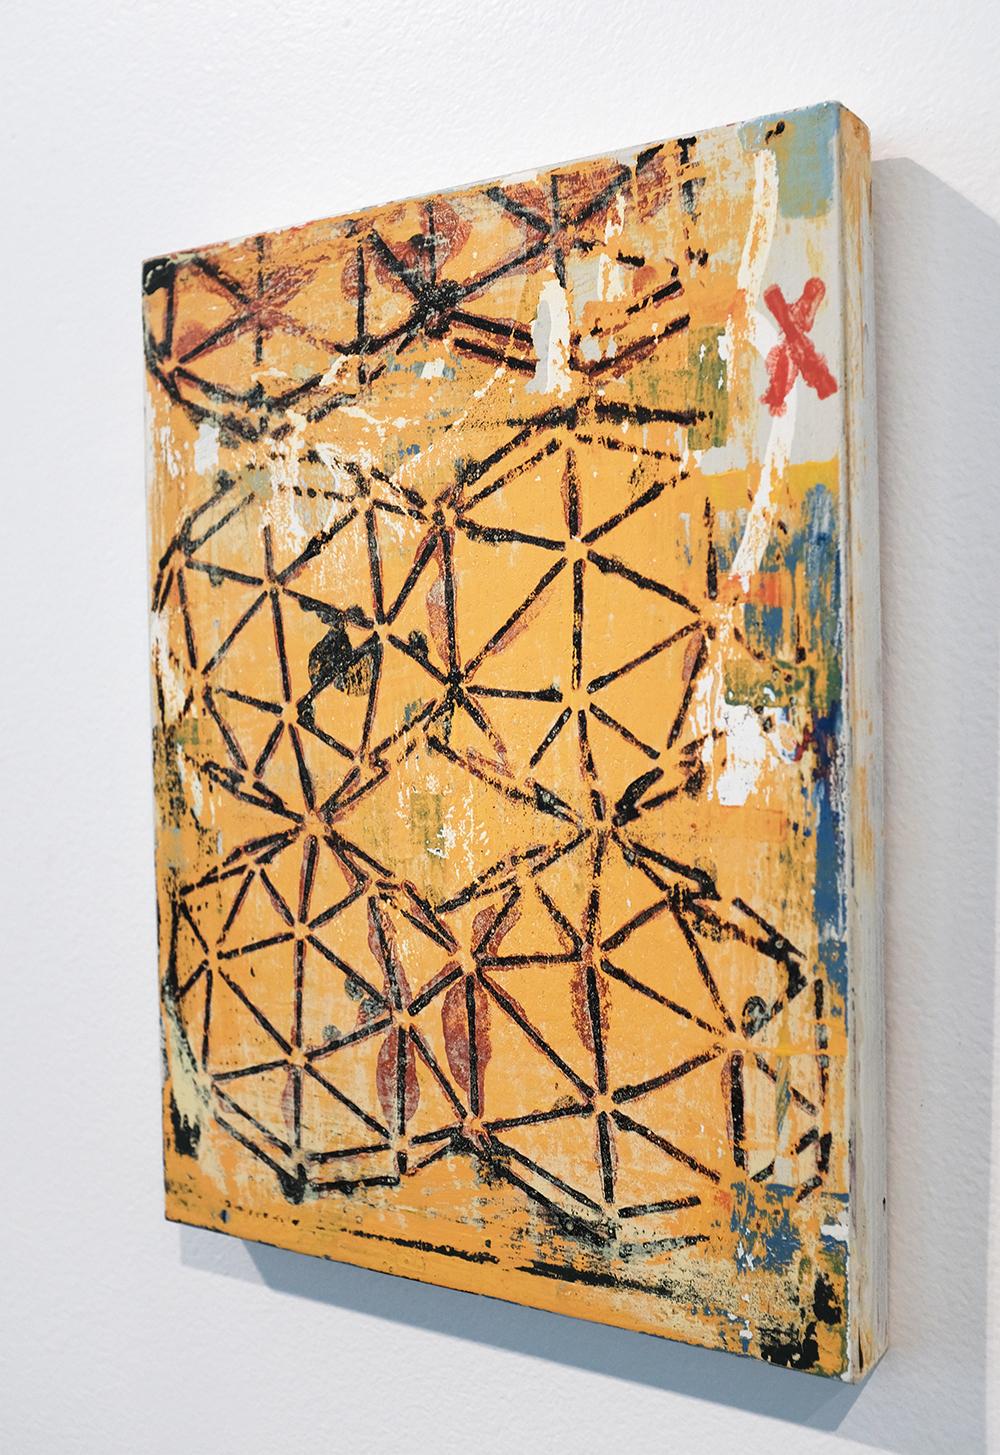 Xanadu, 2008-19, acrylic and paste on wood, 9 x 12 inches